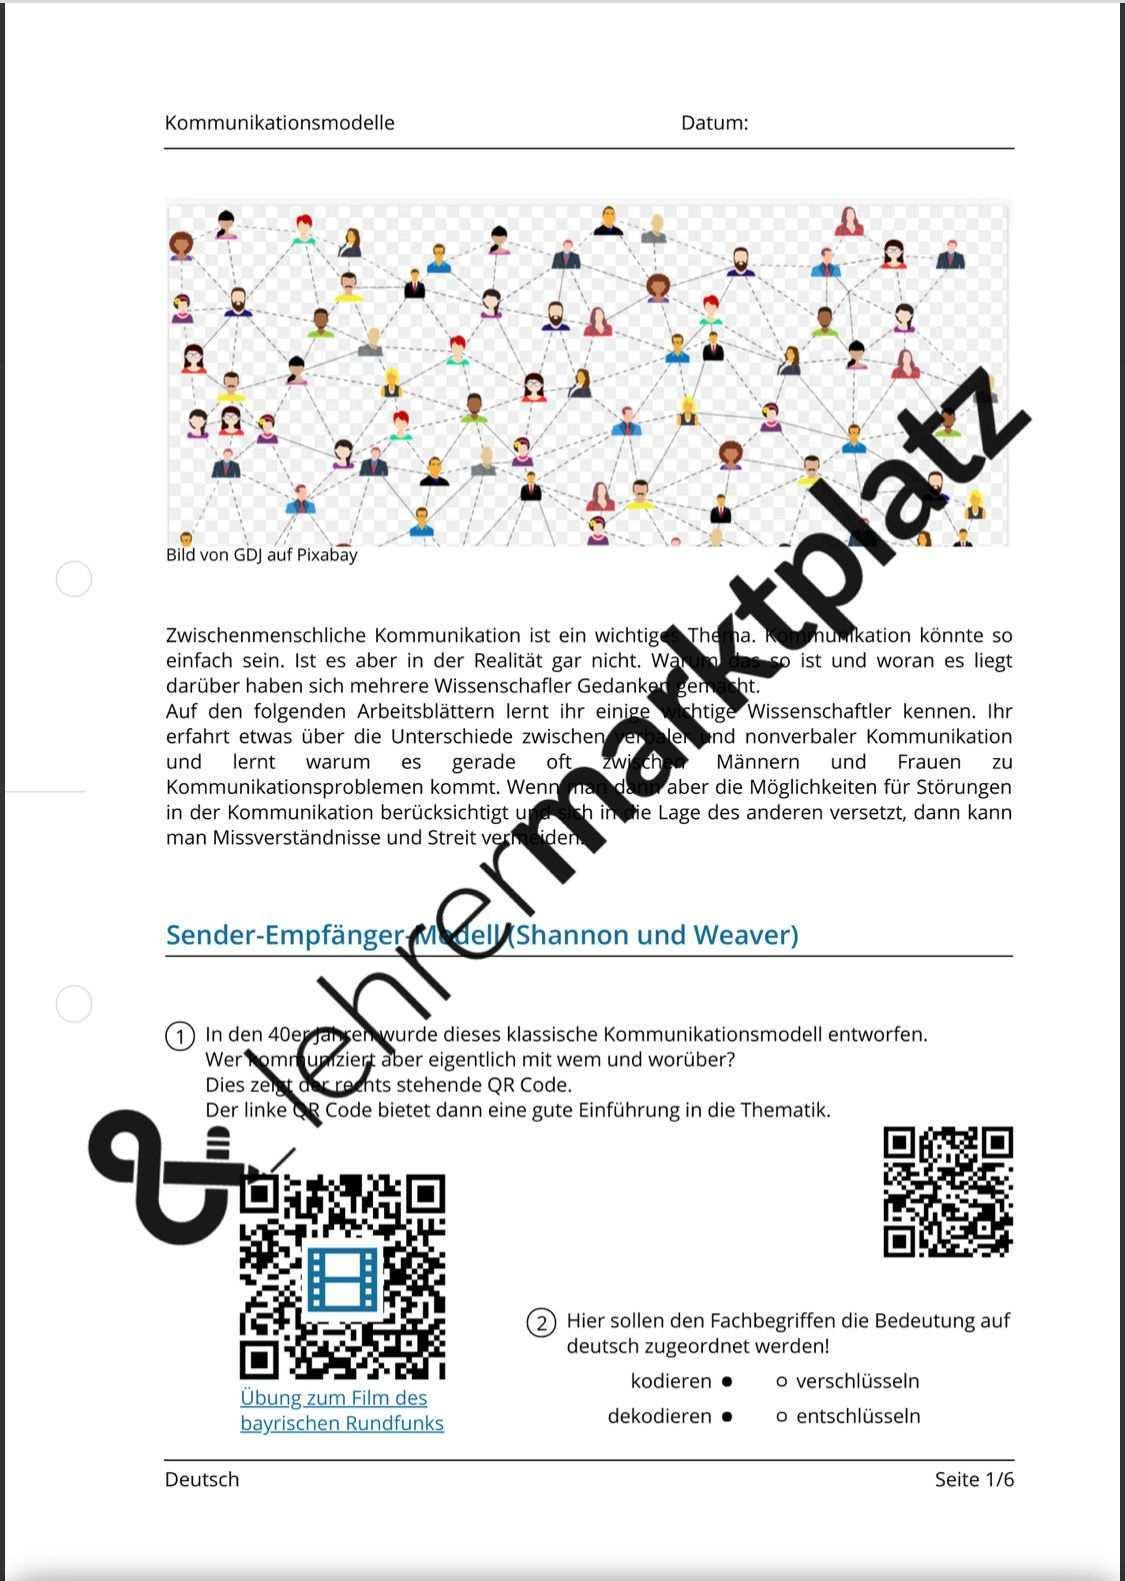 Kommunikationsmodelle Qr Codes Kommunikationsmodelle Kommunikation Zwischenmenschliche Kommunikation